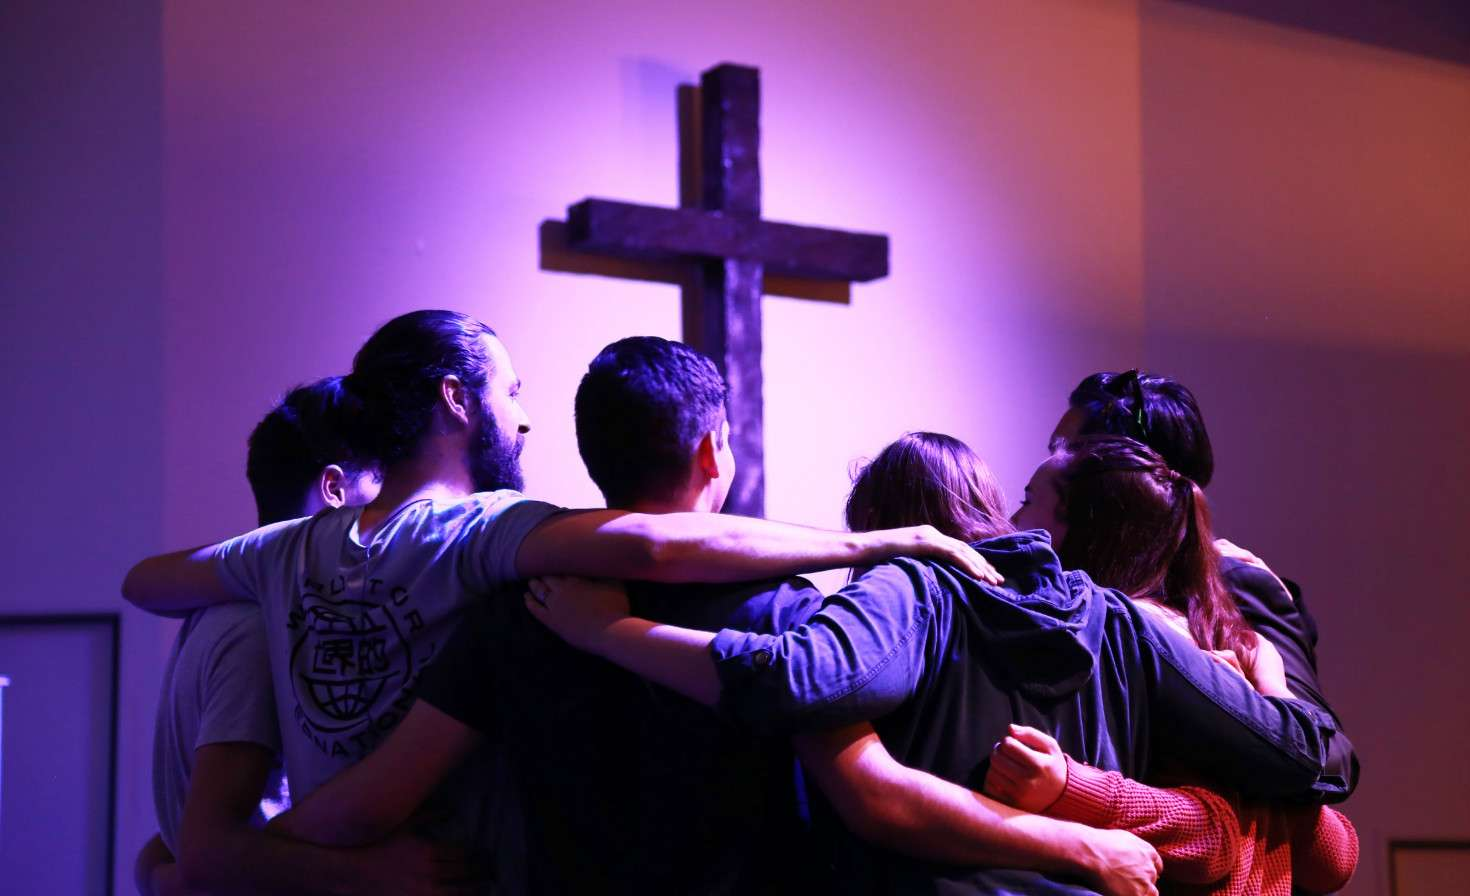 UCA SA - The importance of church planting